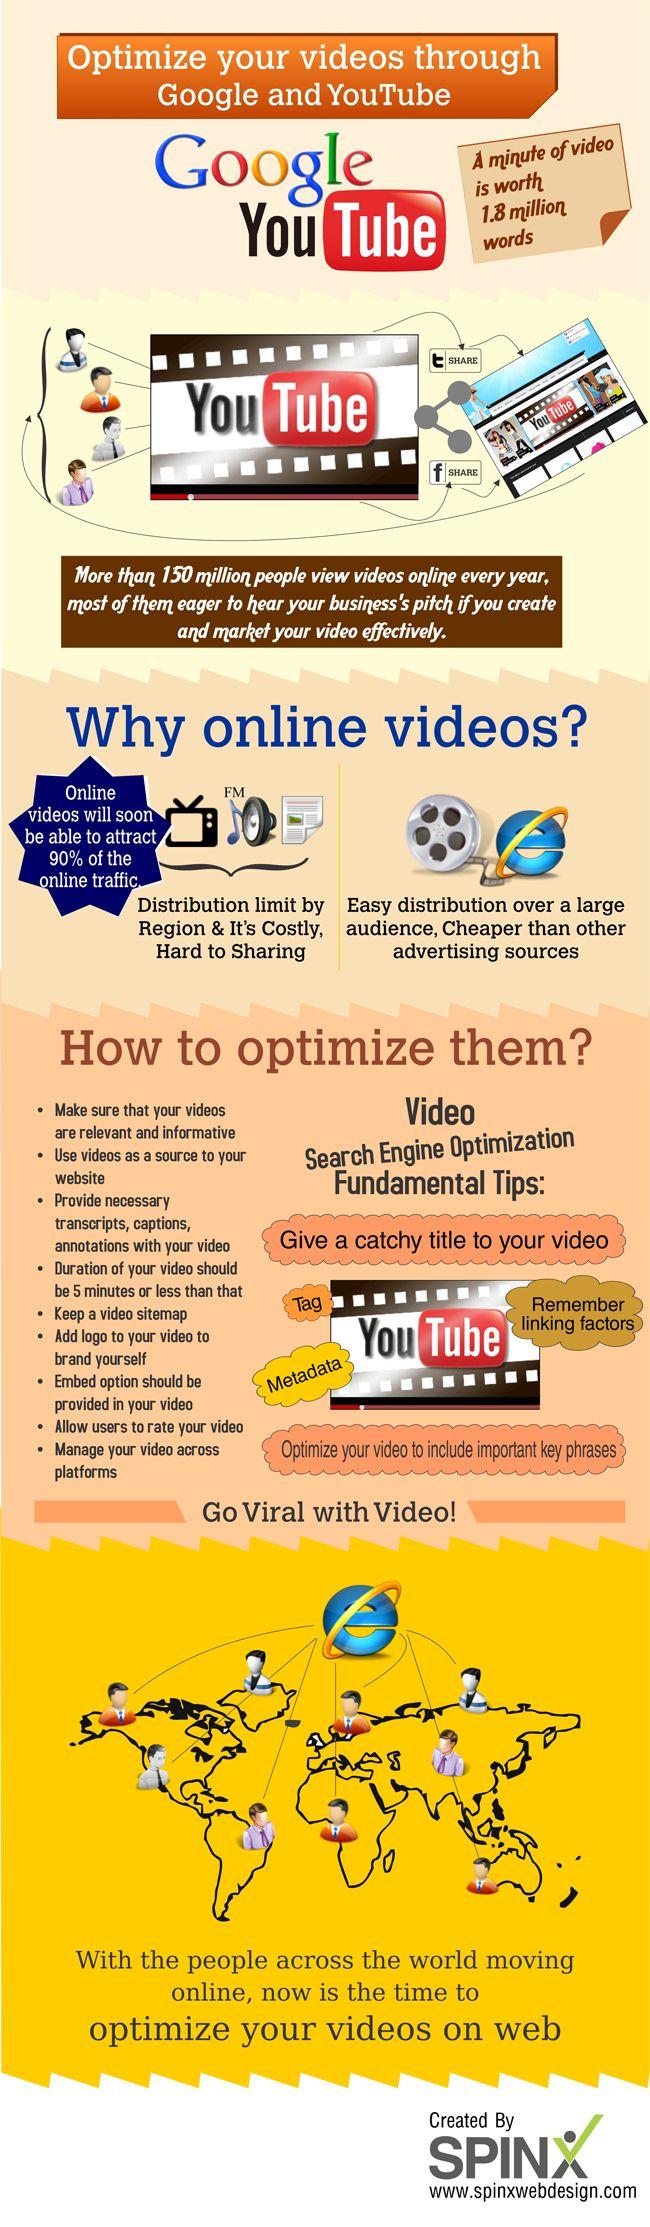 Online Video Marketing through Google and YouTube #infographicMarketing Strategies, Digital Marketing, Internet Marketing, Online Videos, Videos Marketing, Social Media, Optimism Videos, Socialmedia, Youtube Infographic